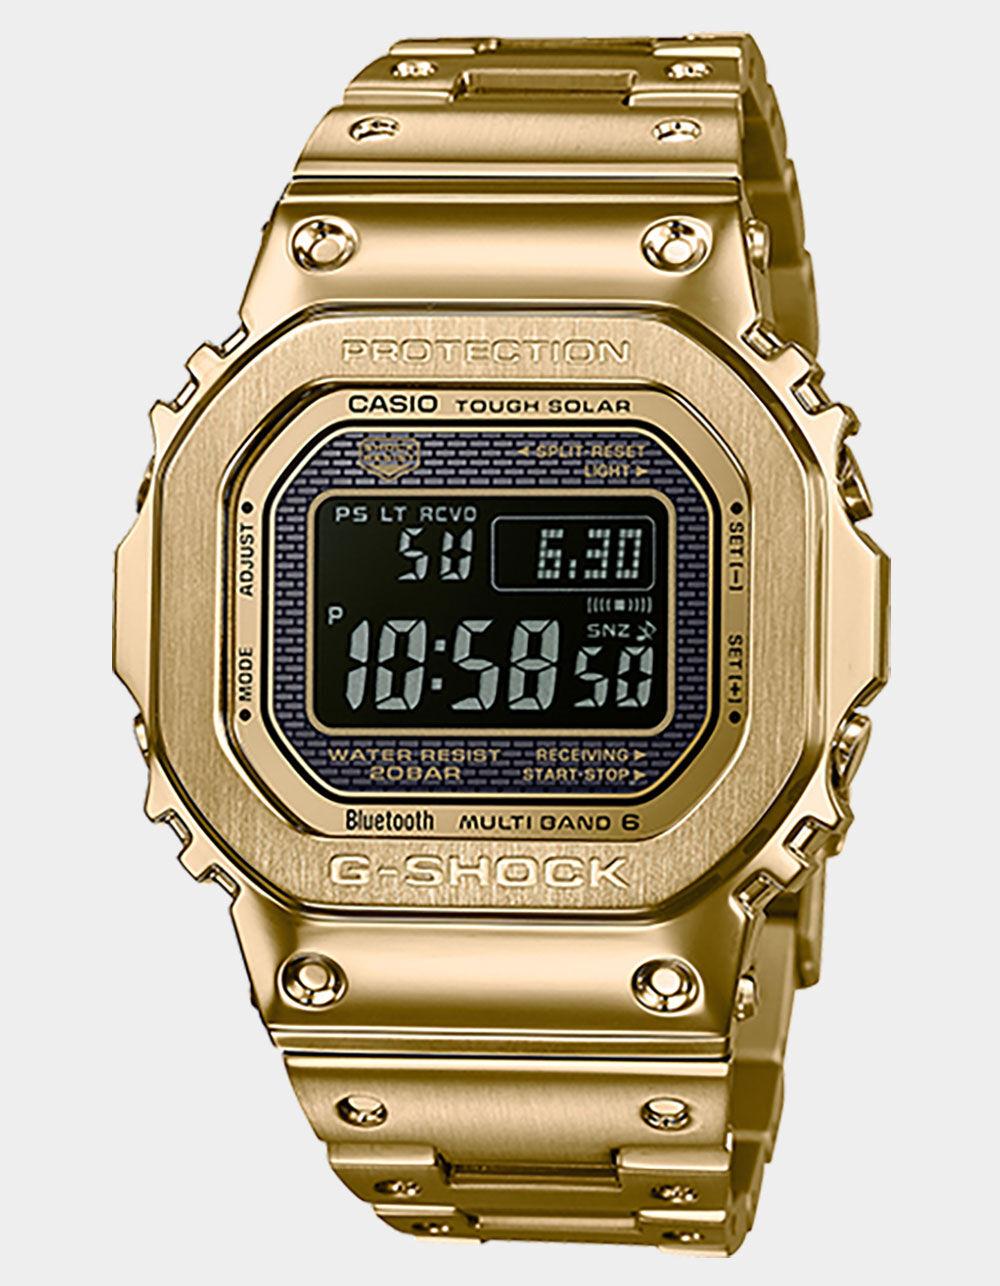 G-SHOCK GMW-B5000GD-9 Watch